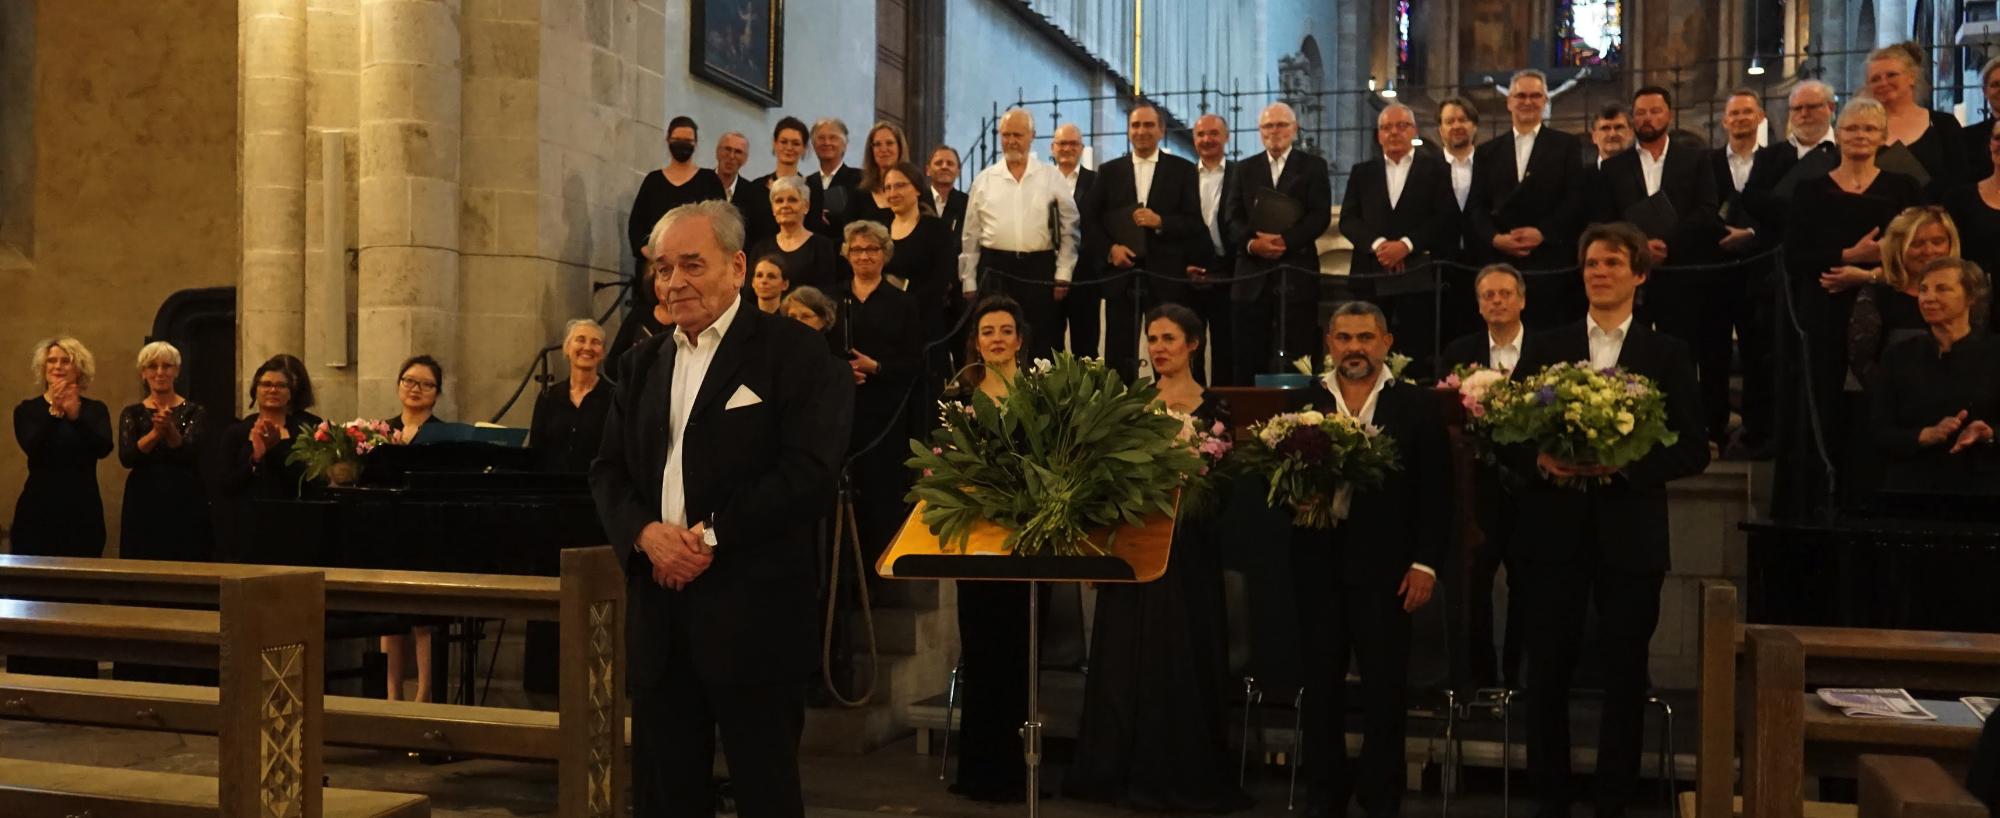 Philharmonischer Chor Köln